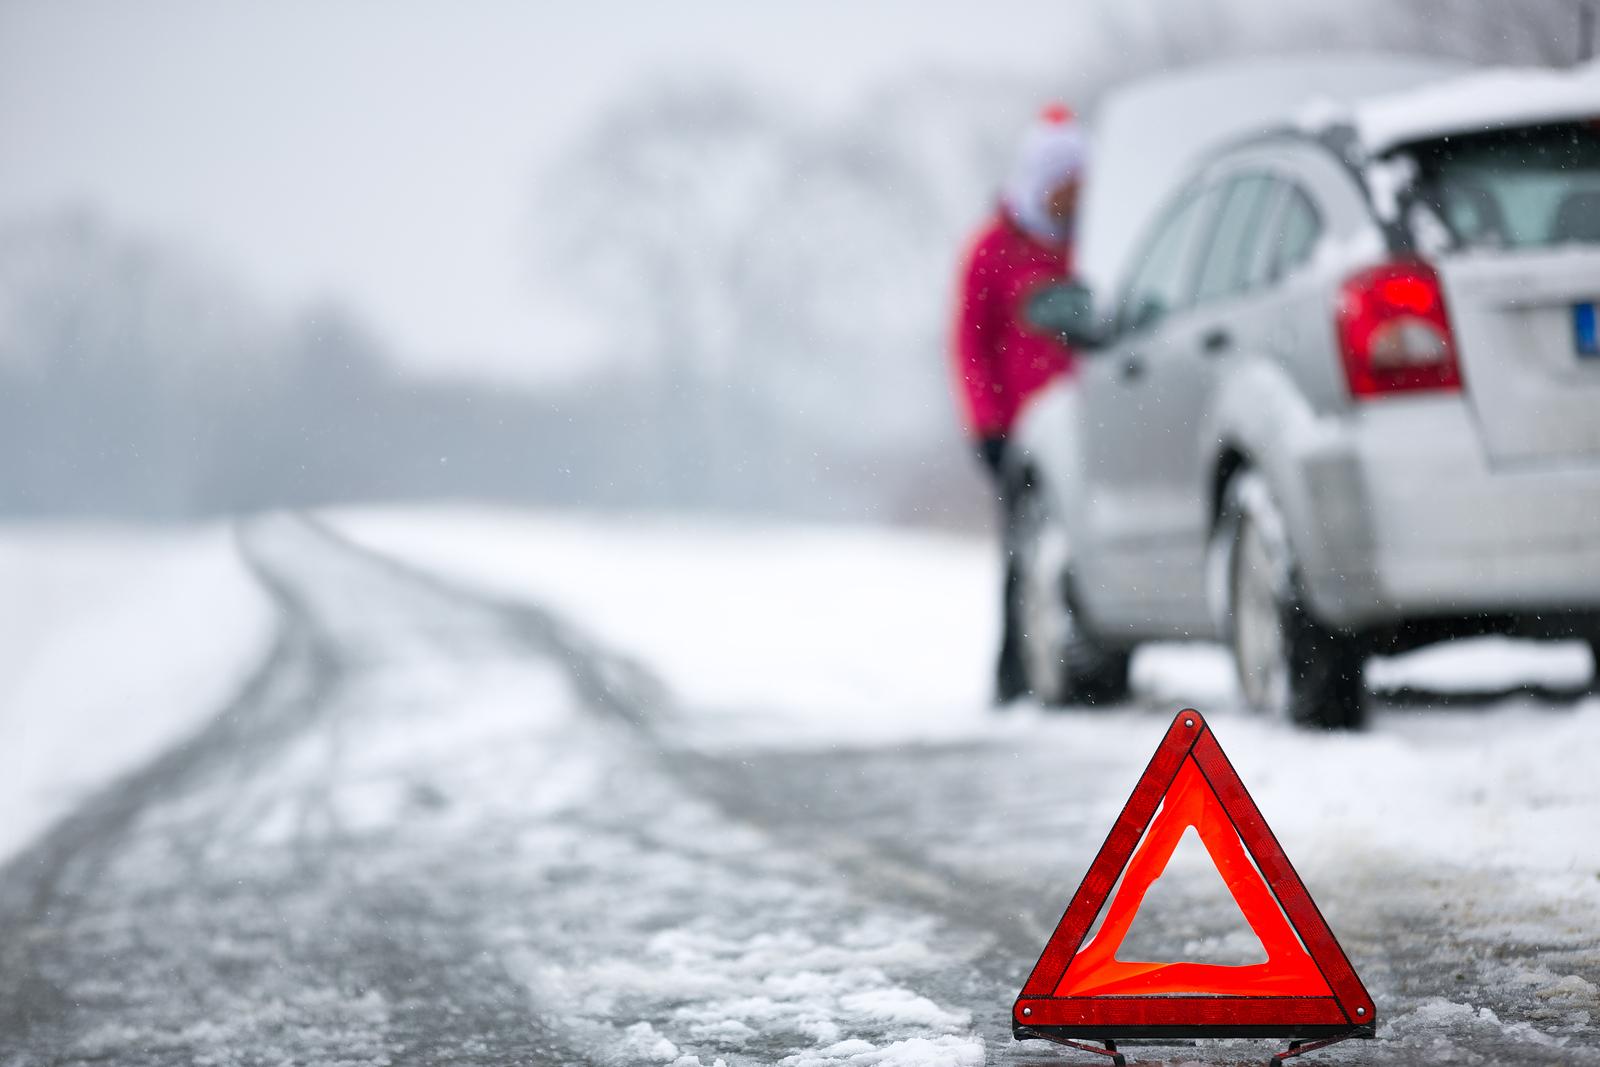 Winter-car breakdown-warning triangle-travel nursing memory